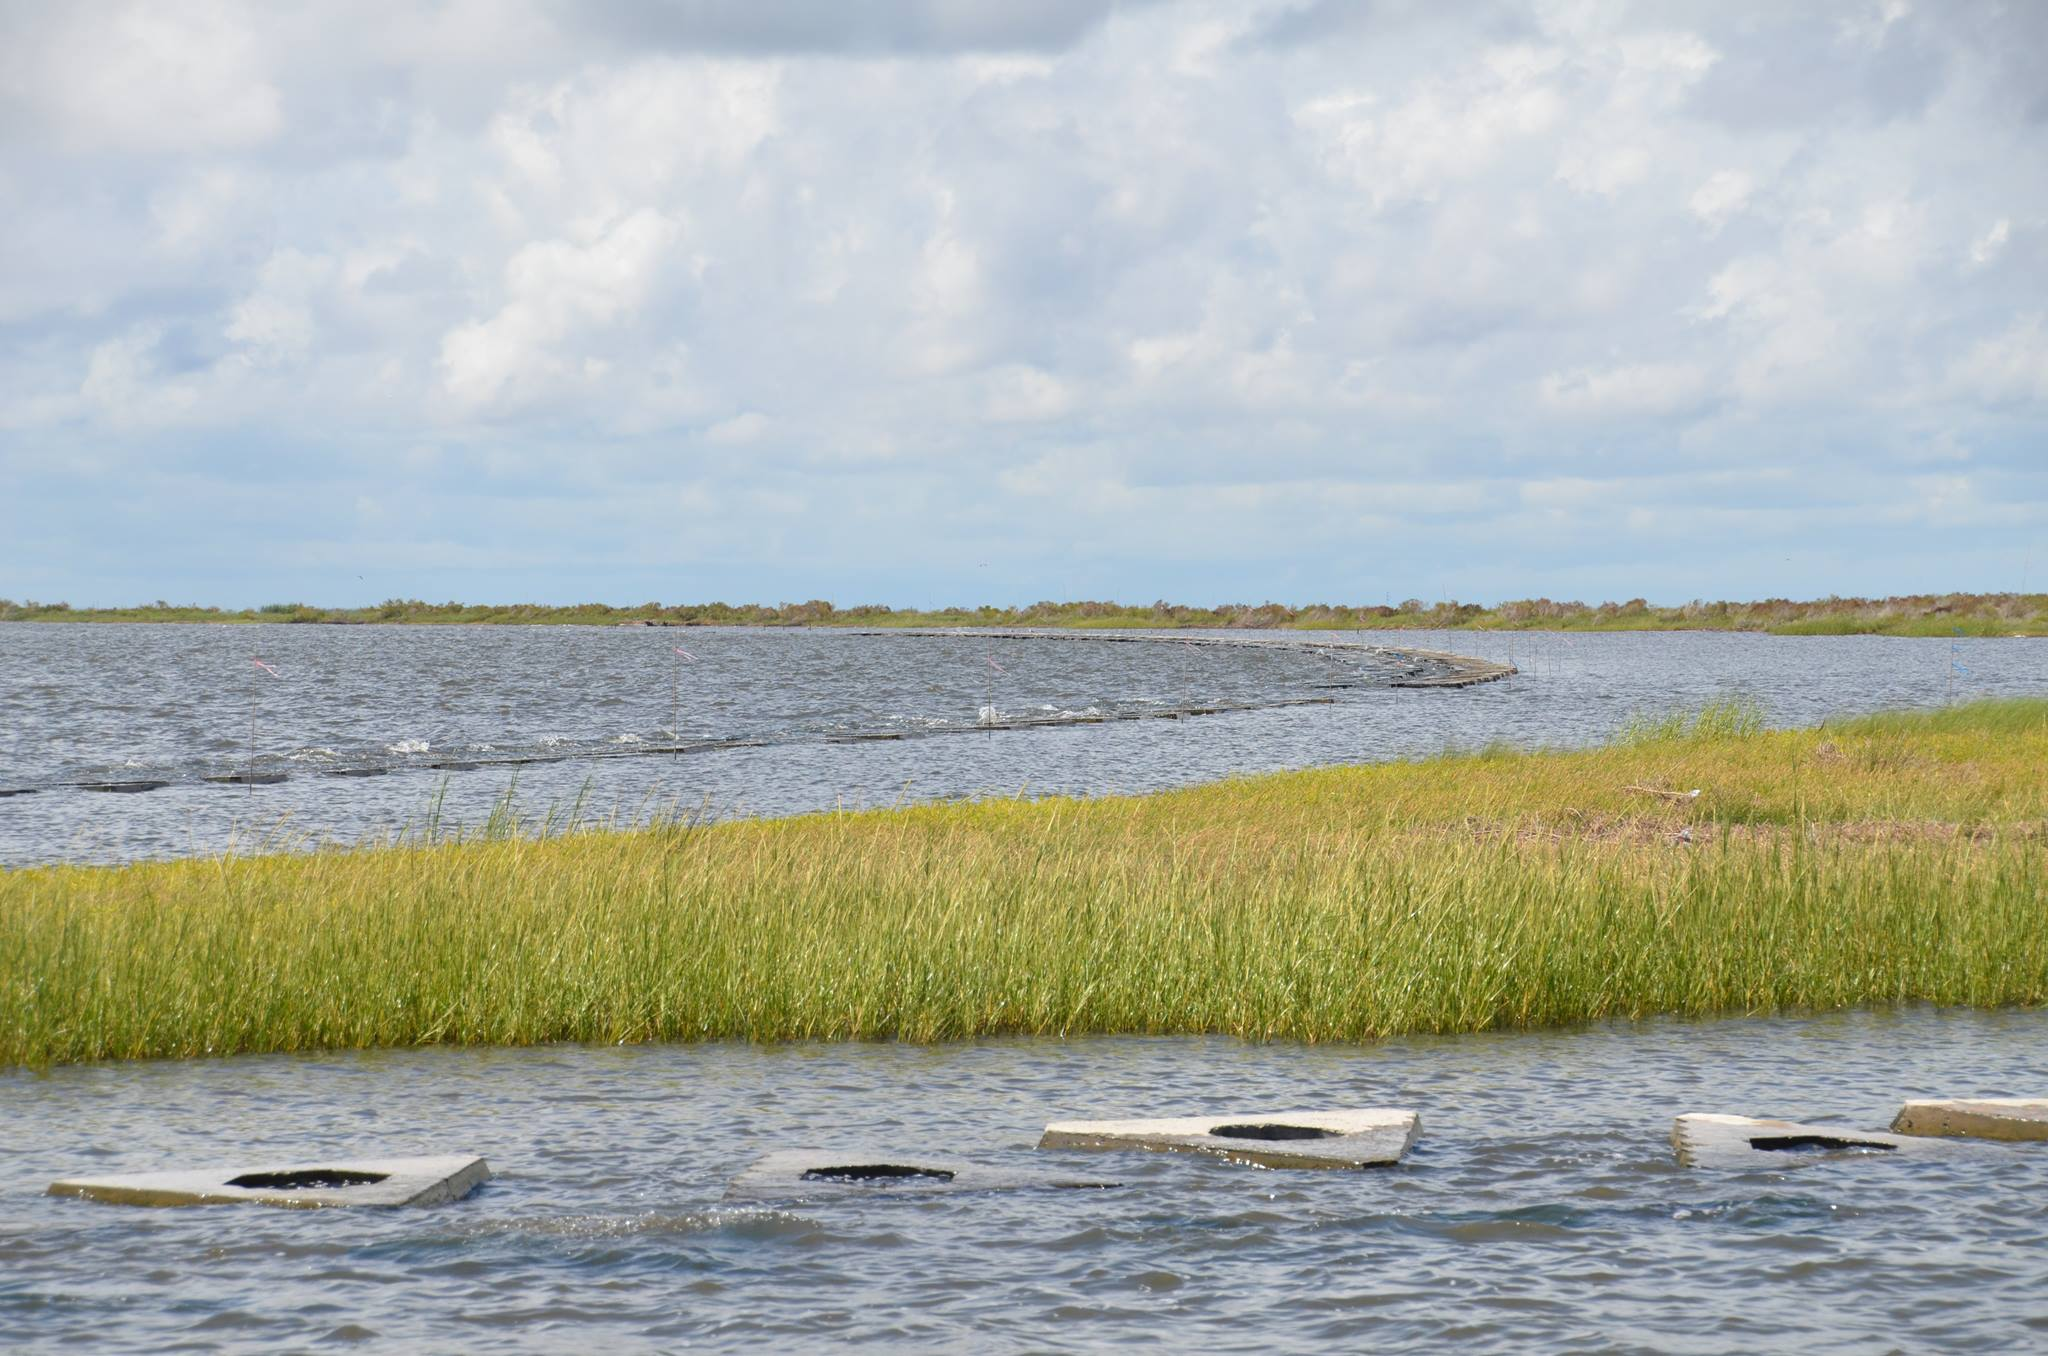 Marsh and water habitat in Louisiana. Credit: Coastal Protection and Restoration Authority.